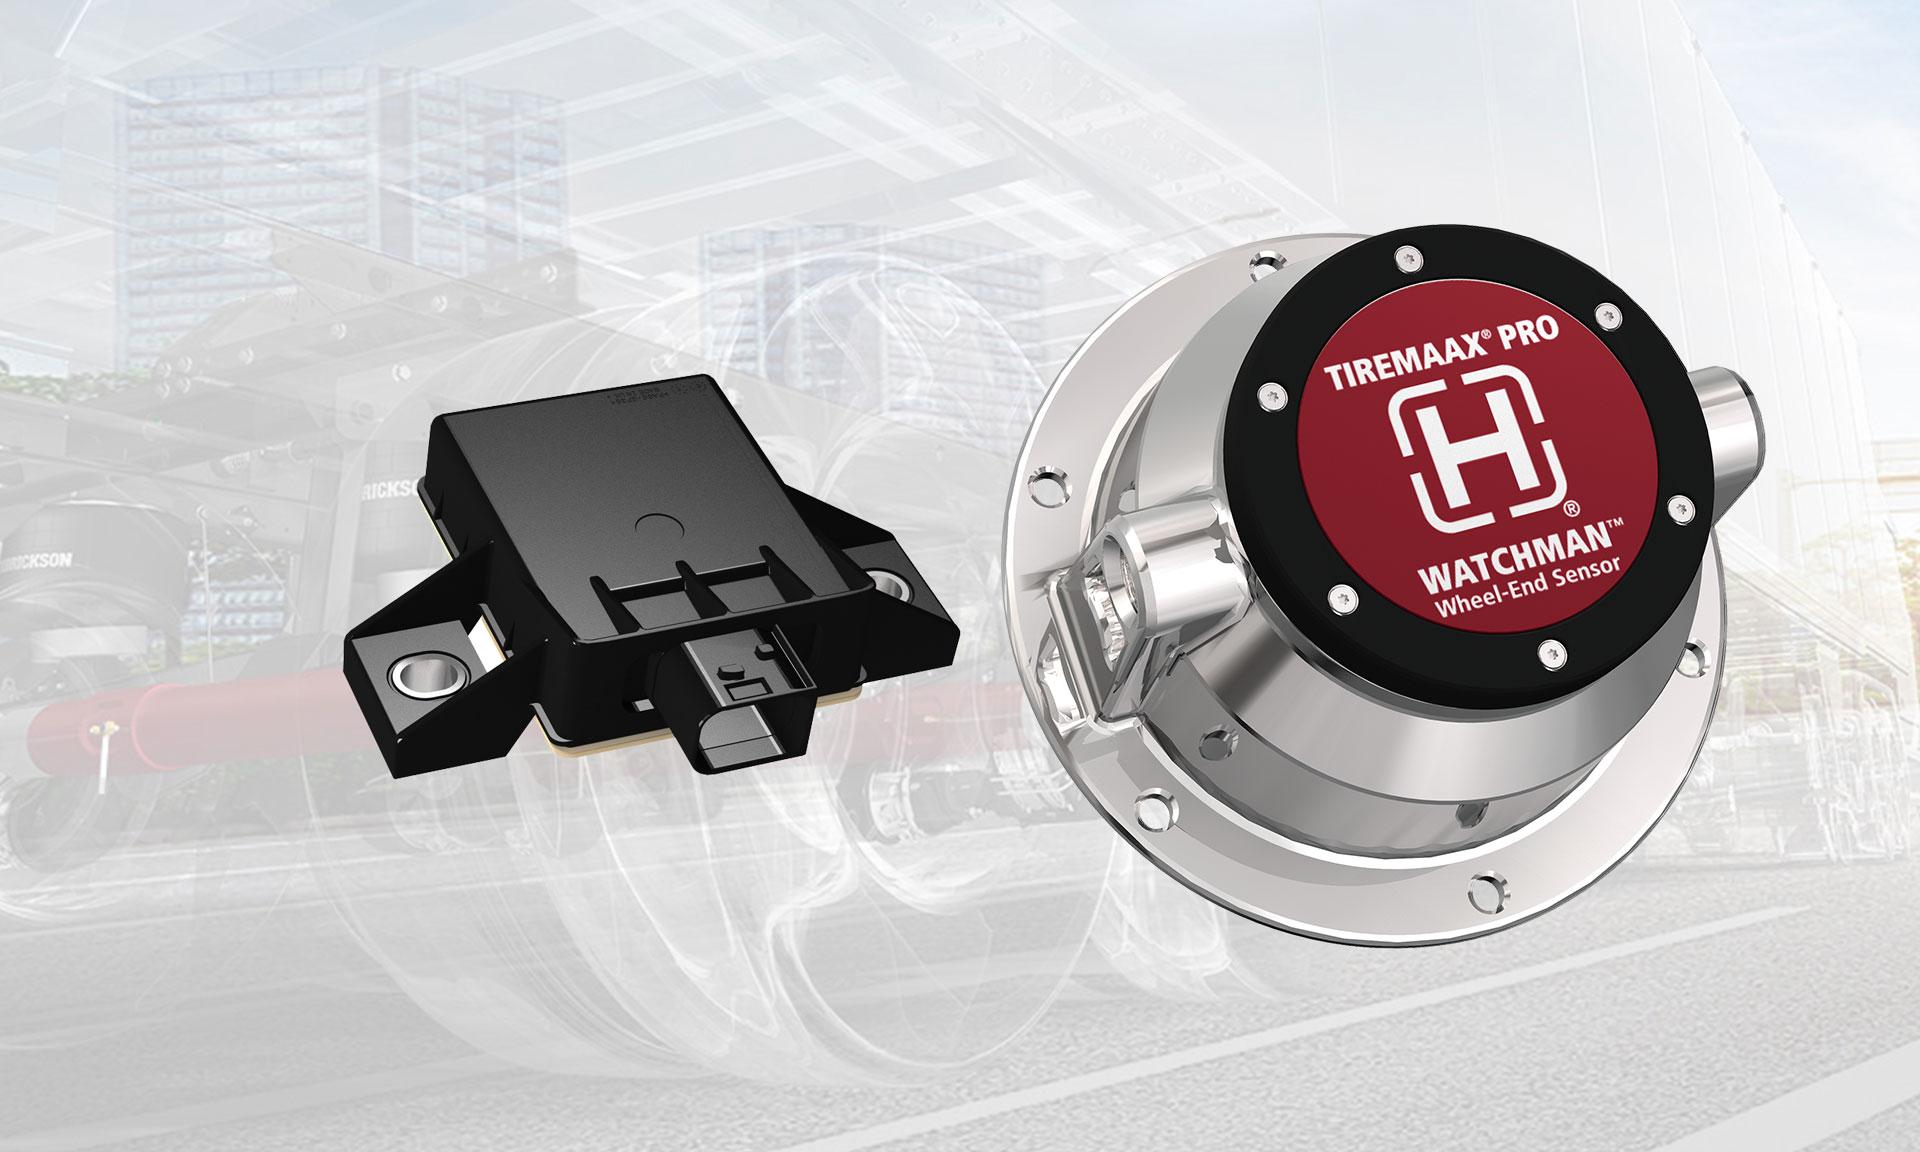 Hendrickson TIREMAAX PRO WATCHMAN Wheel-End Sensor